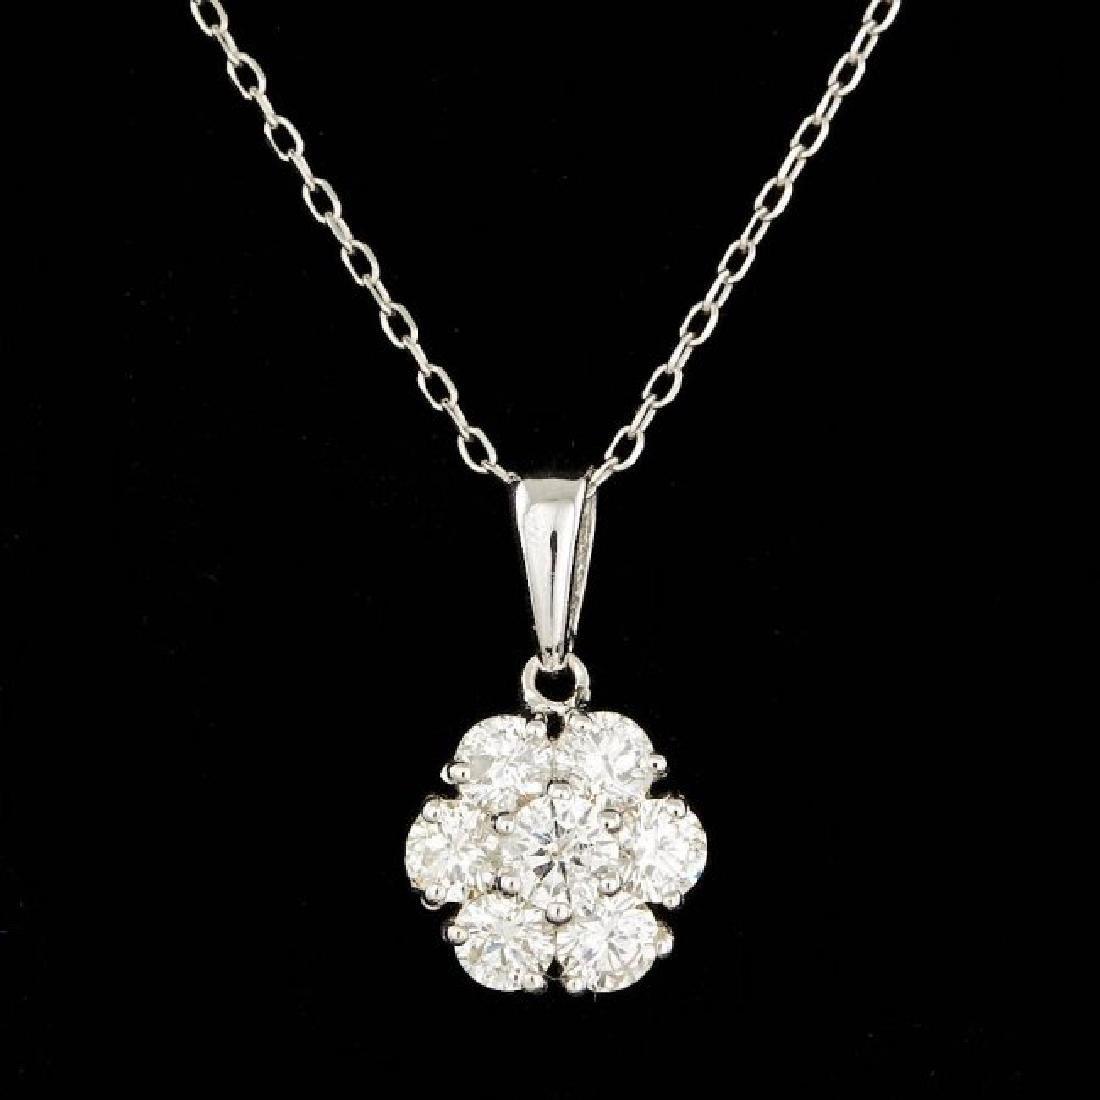 14k White Gold 0.90ct Diamond Pendant